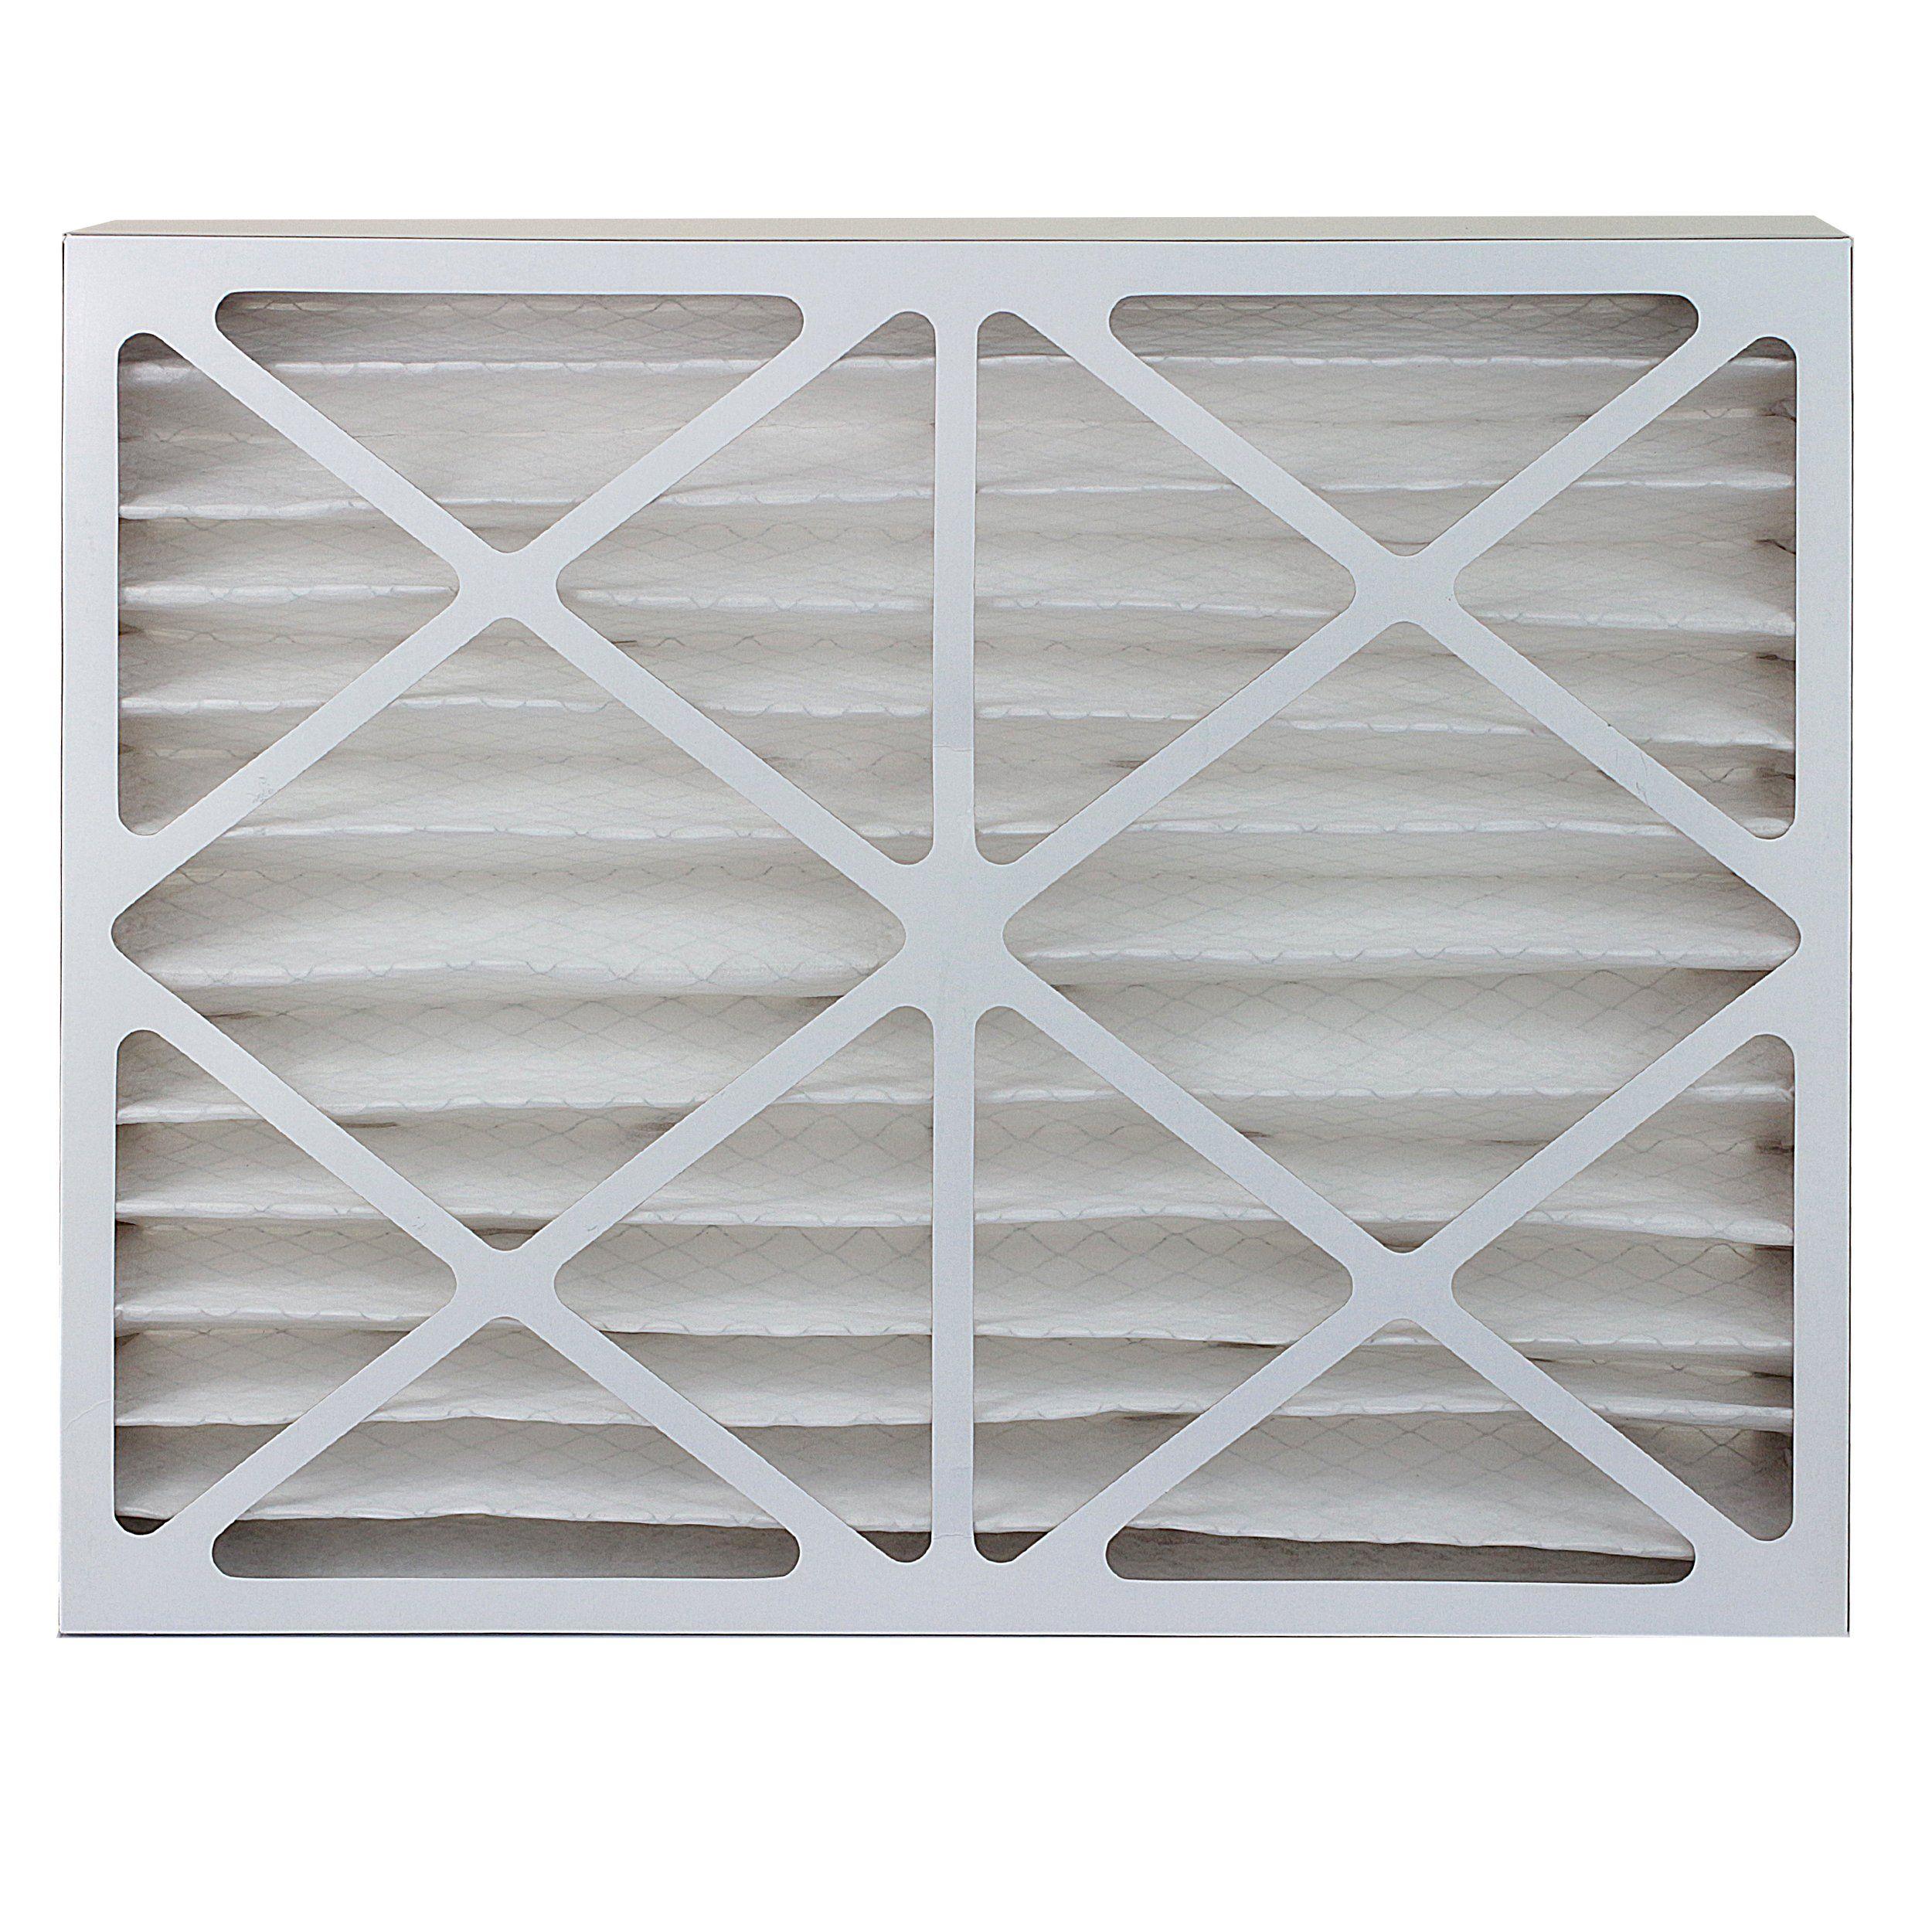 FilterBuy 24x36x4 MERV 8 Pleated AC Furnace Air Filter